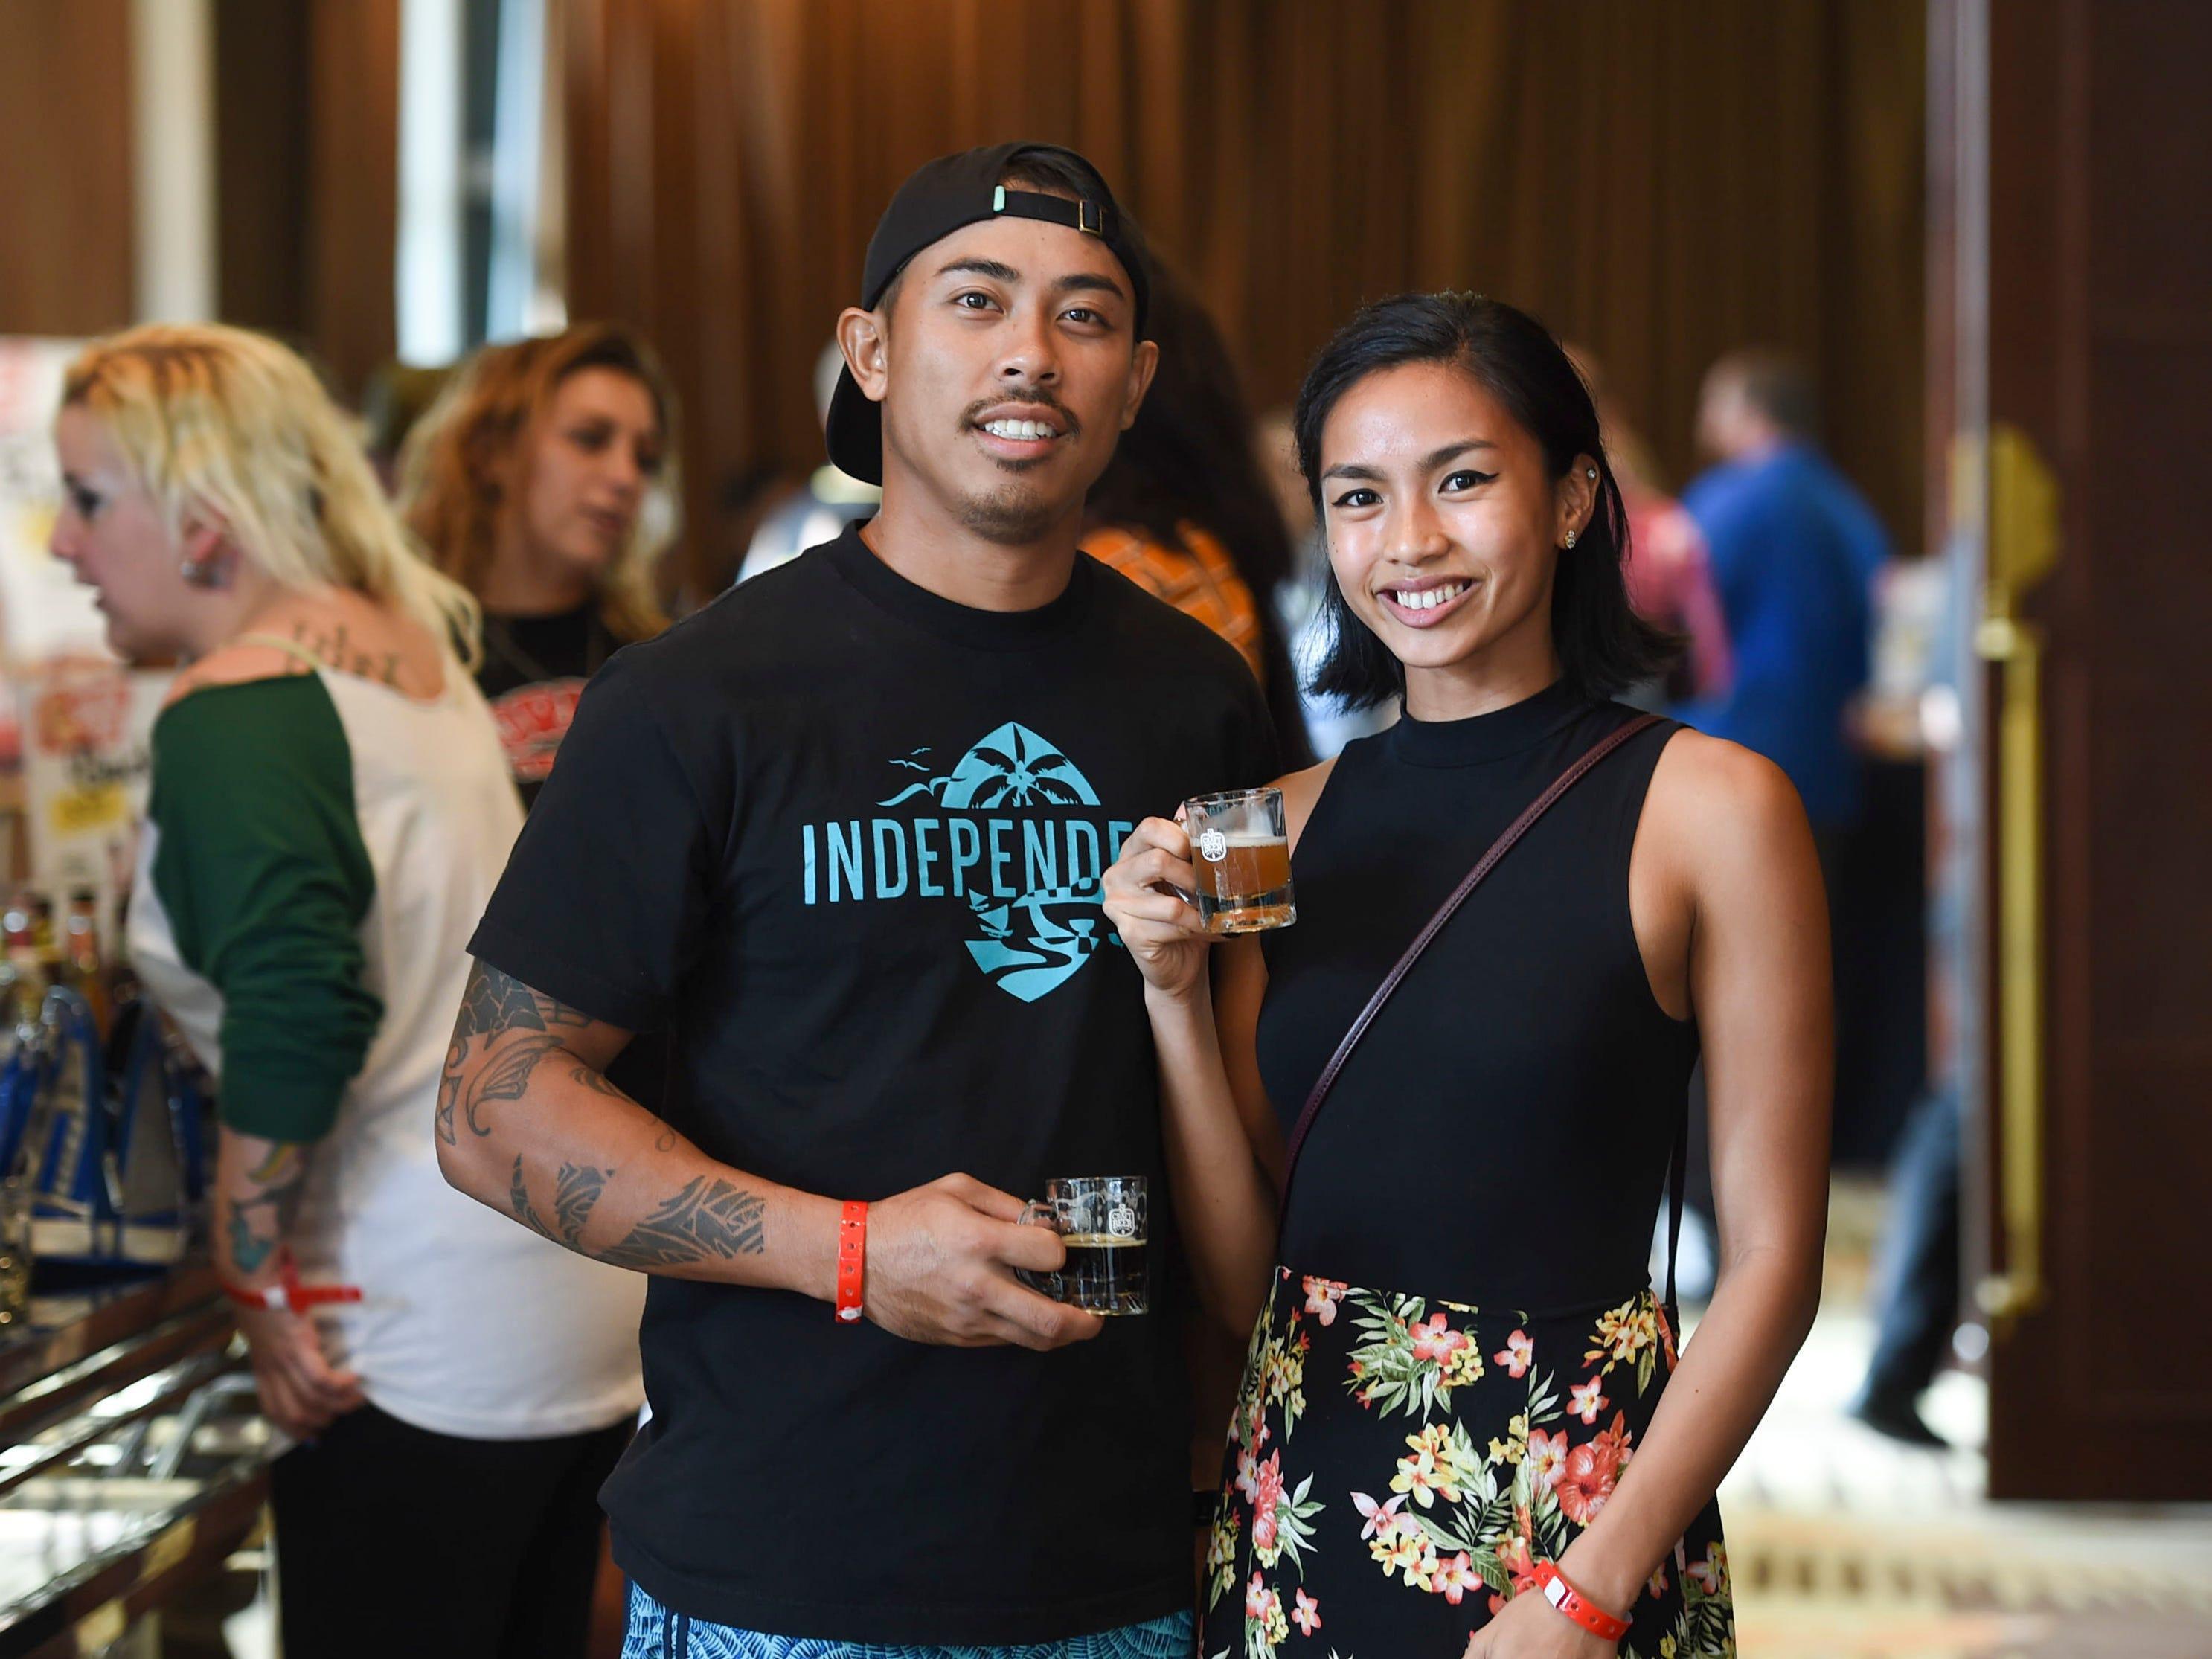 Ykhy Dela Cruz and Josh Carbullido during the Circle K Craft Beer Festival at the Sheraton Laguna Guam Resort, Sept. 29, 2018.